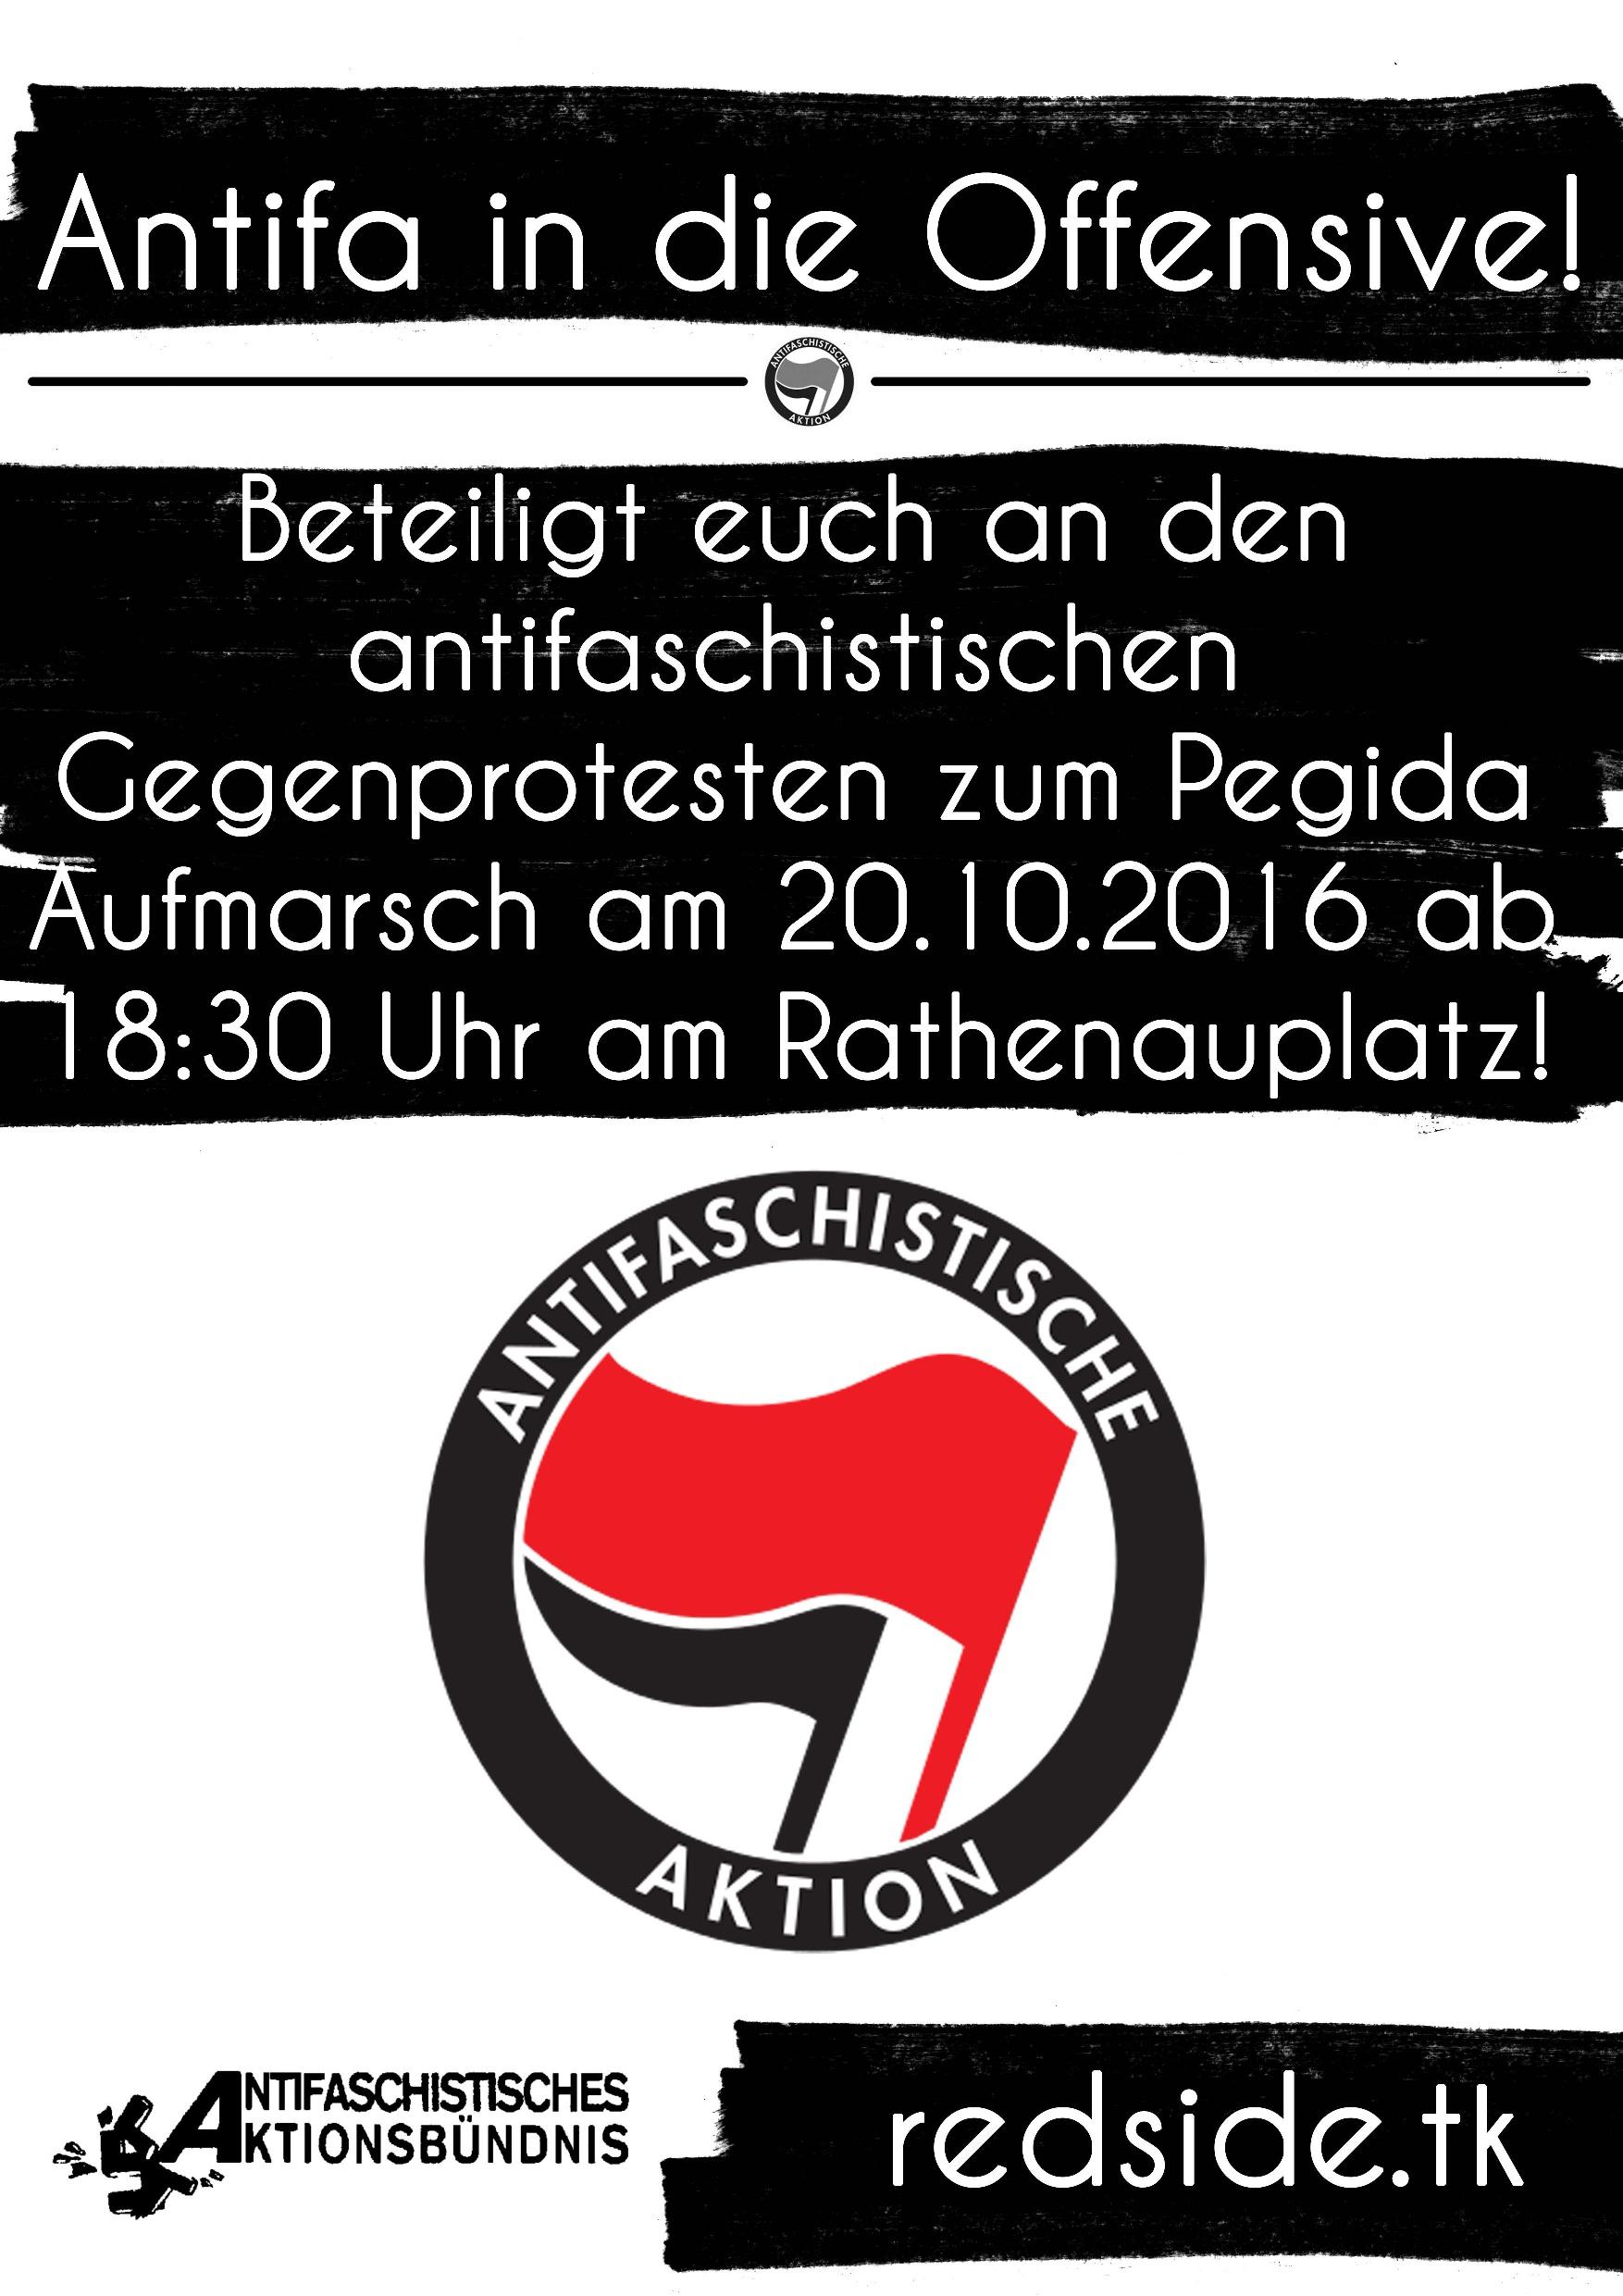 AAB Gegenprotest Pegida 20.10.2016 Nbg